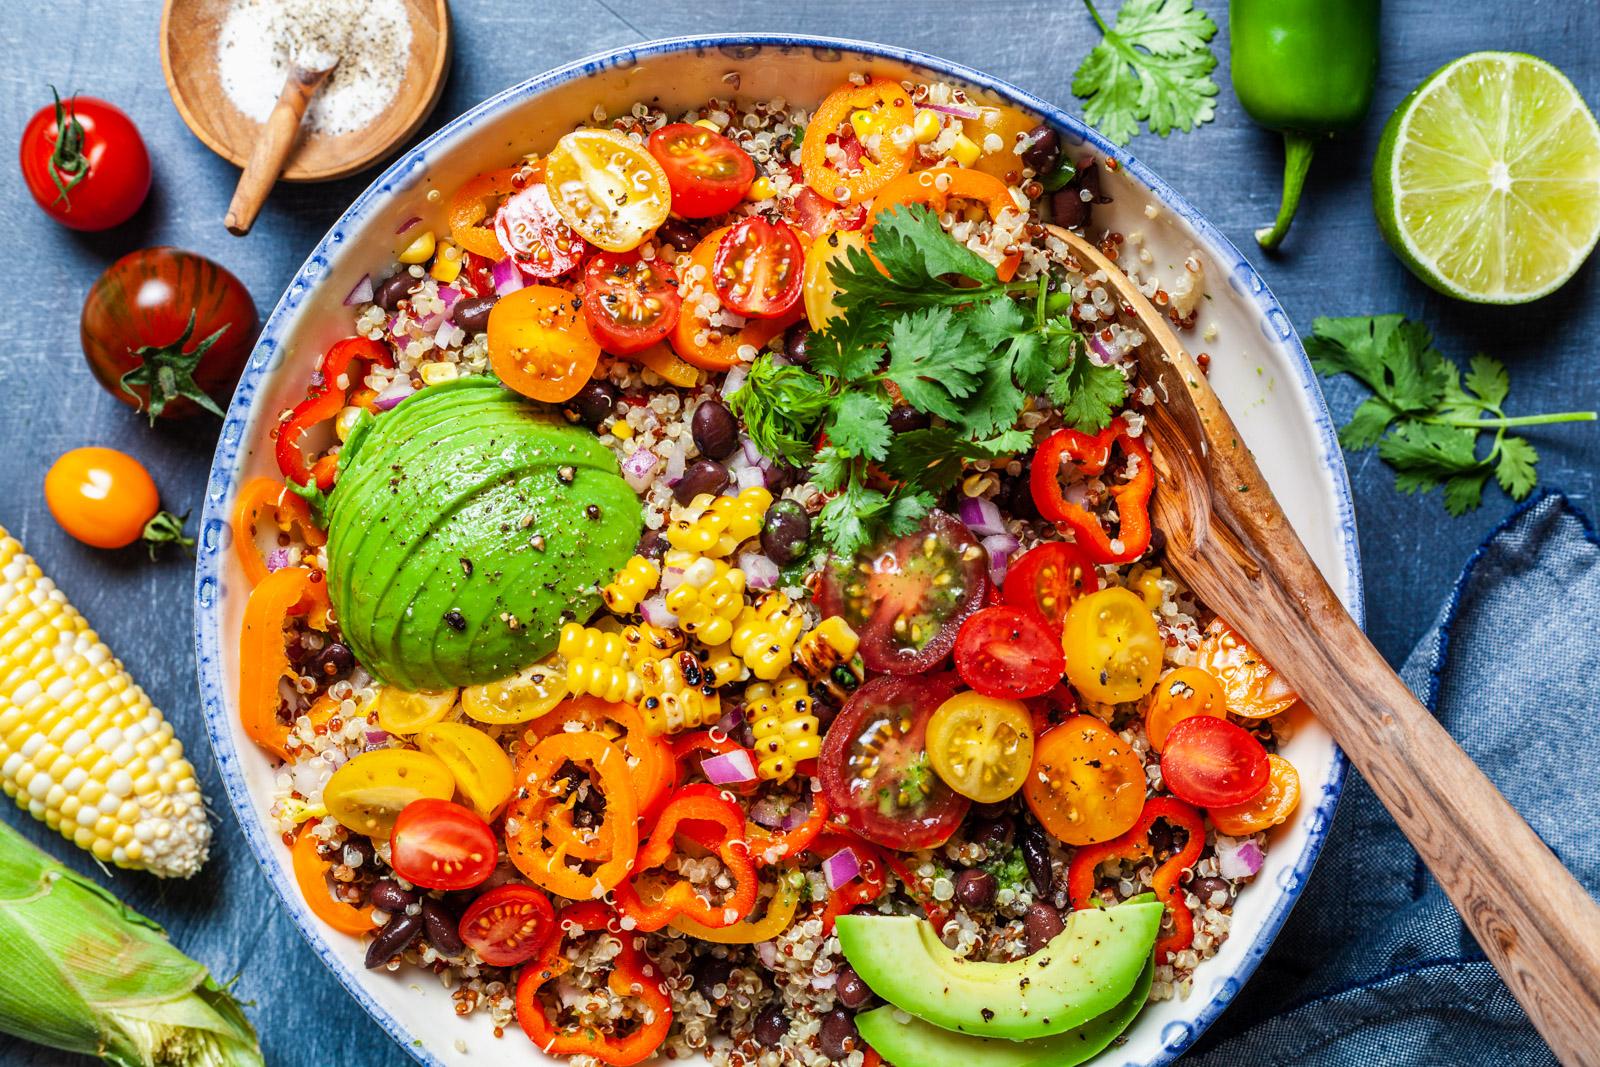 Corn and Quinoa Salad With a Cilantro Jalapeño Lime Dressing